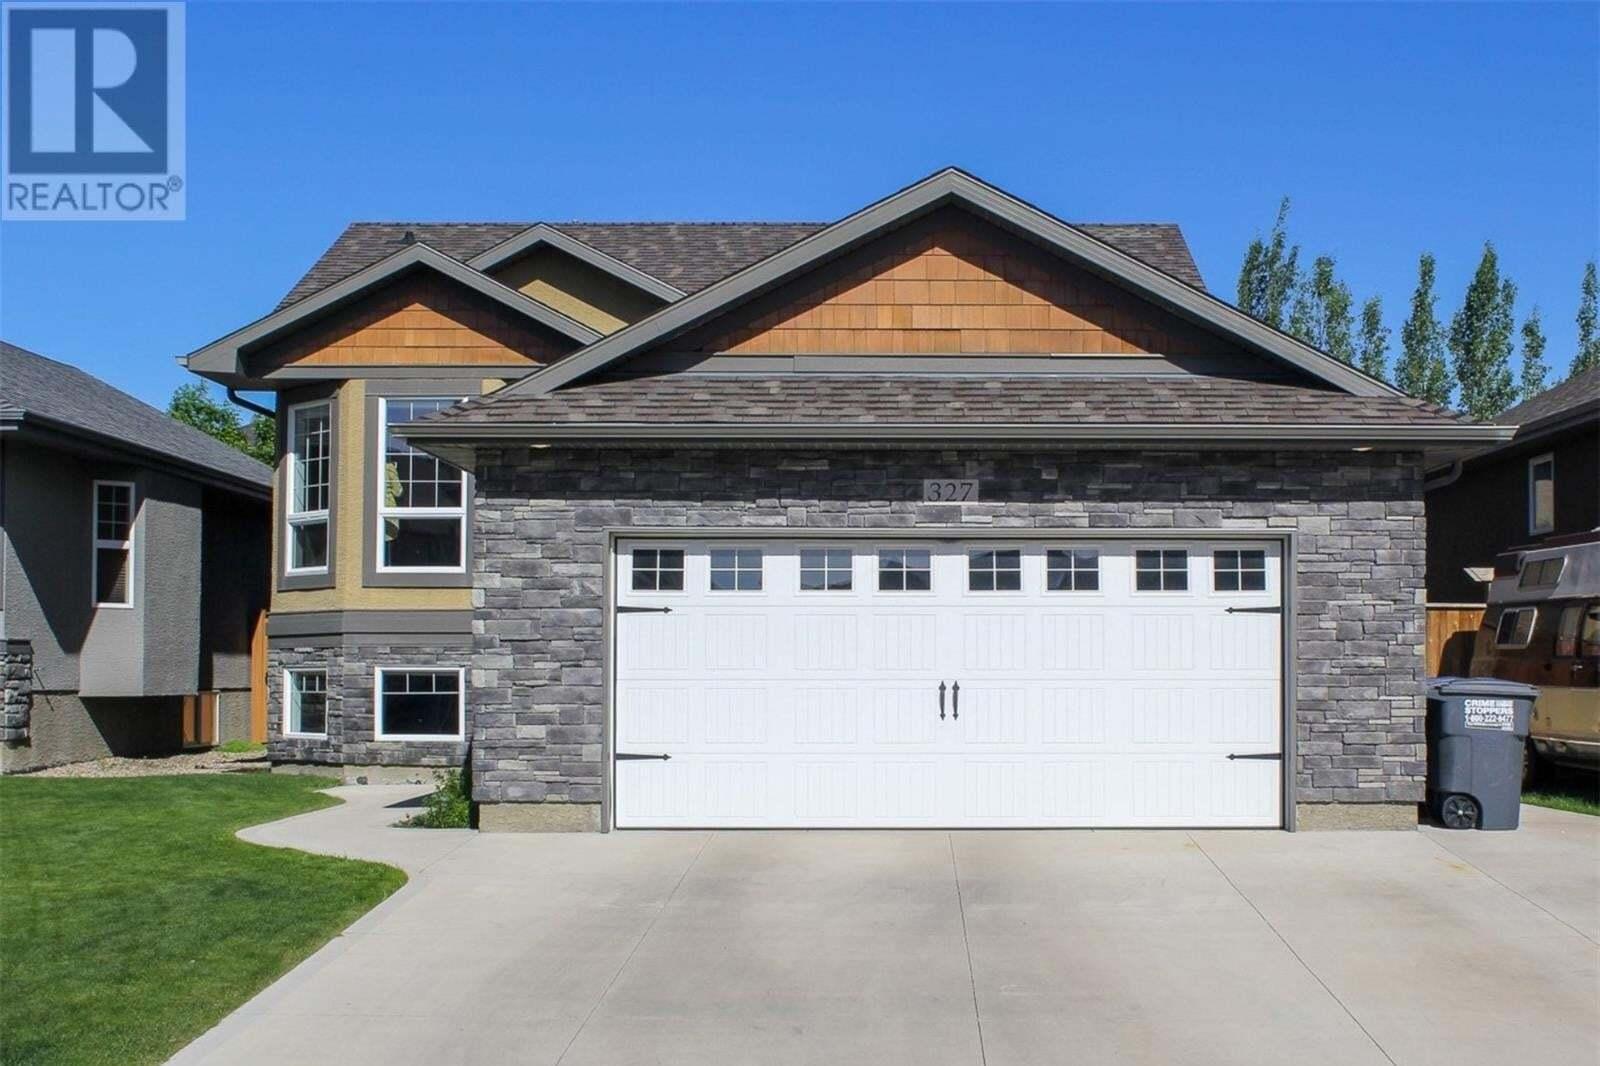 House for sale at 327 Laycock Ln Saskatoon Saskatchewan - MLS: SK814634